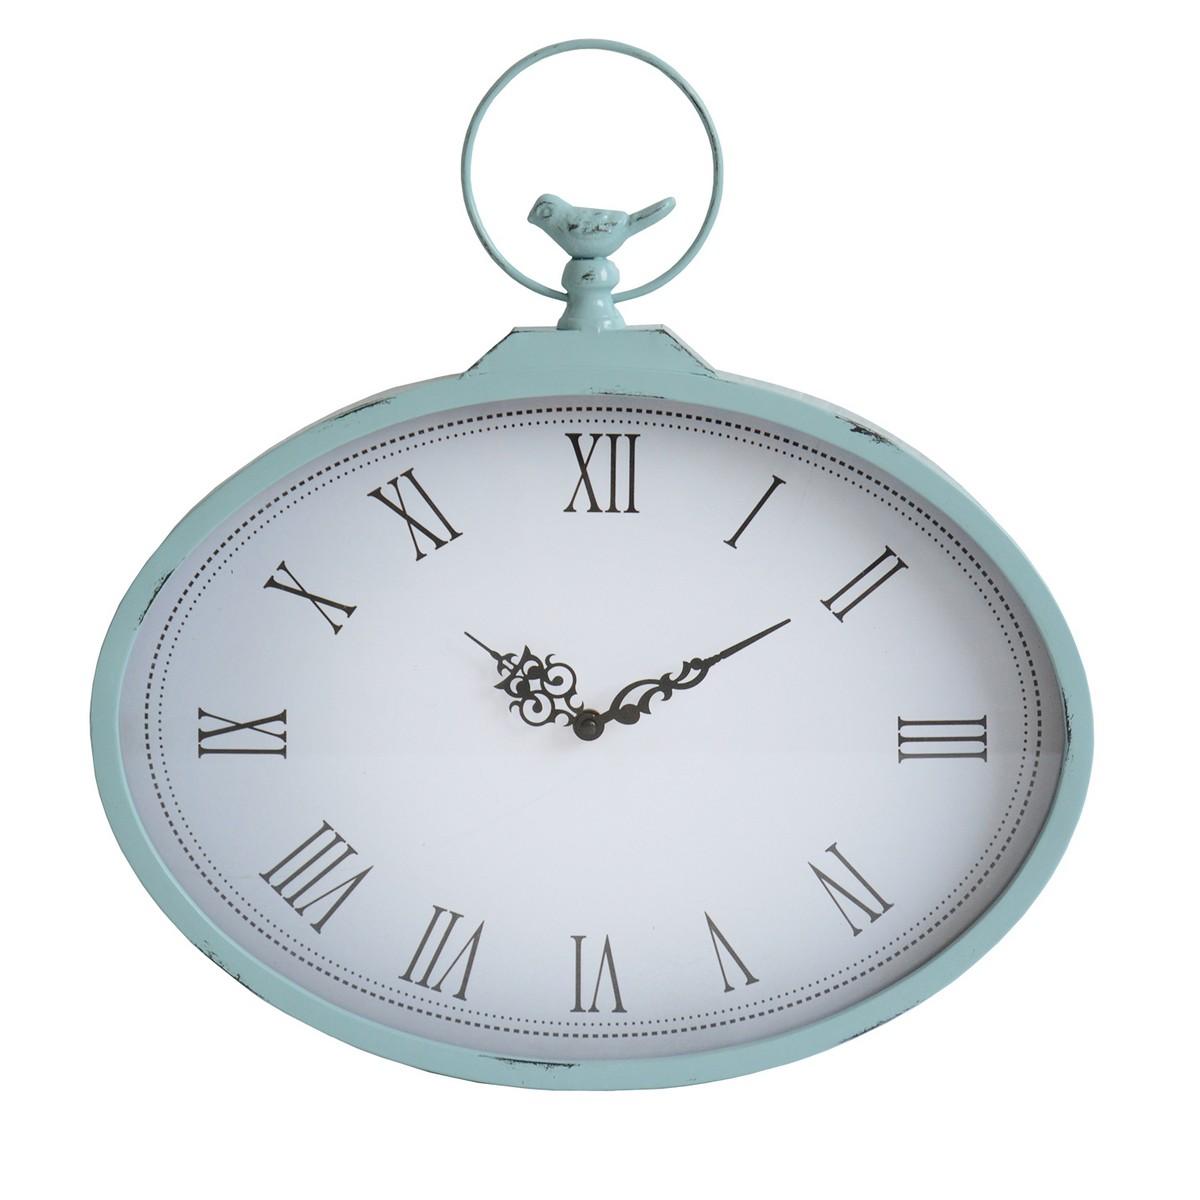 Stratton Home Decor Shabby Wall Clock - Light Blue